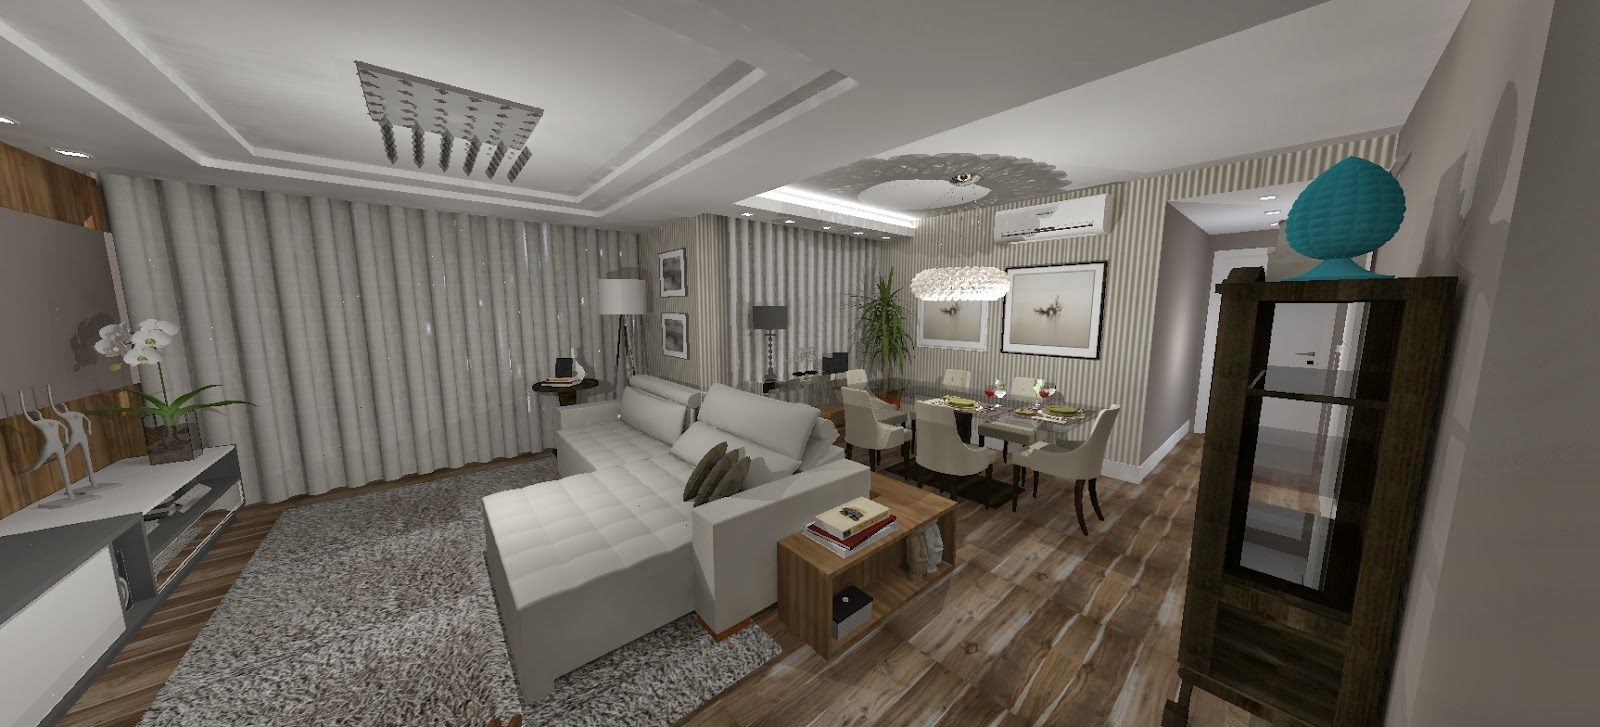 Sala De Jantar Integrada ~  Spolti Arquitetas Associadas Sala de Jantar integrada a Sala de TV